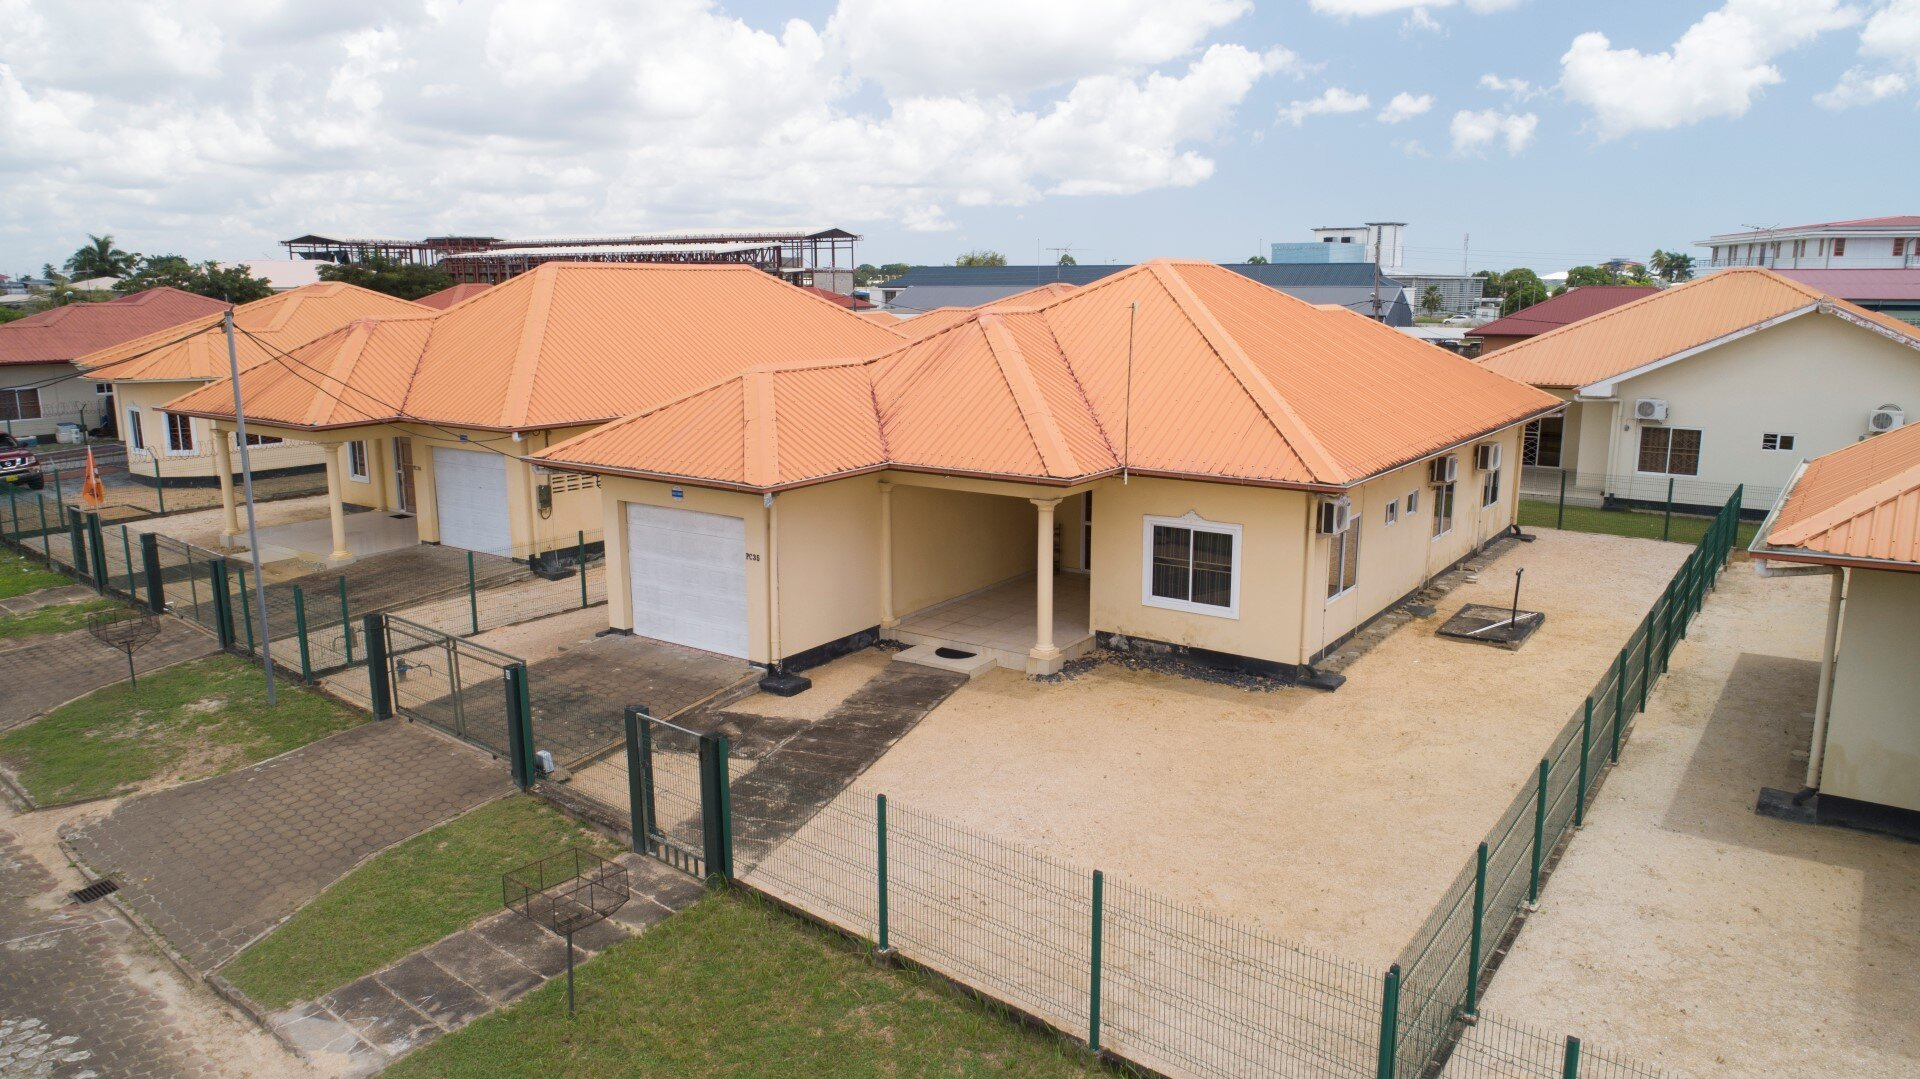 Jainarain Sohansinghlaan 35 - Laagbouw woning op een semi-gated project - Surgoed Makelaardij NV - Paramaribo, Suriname